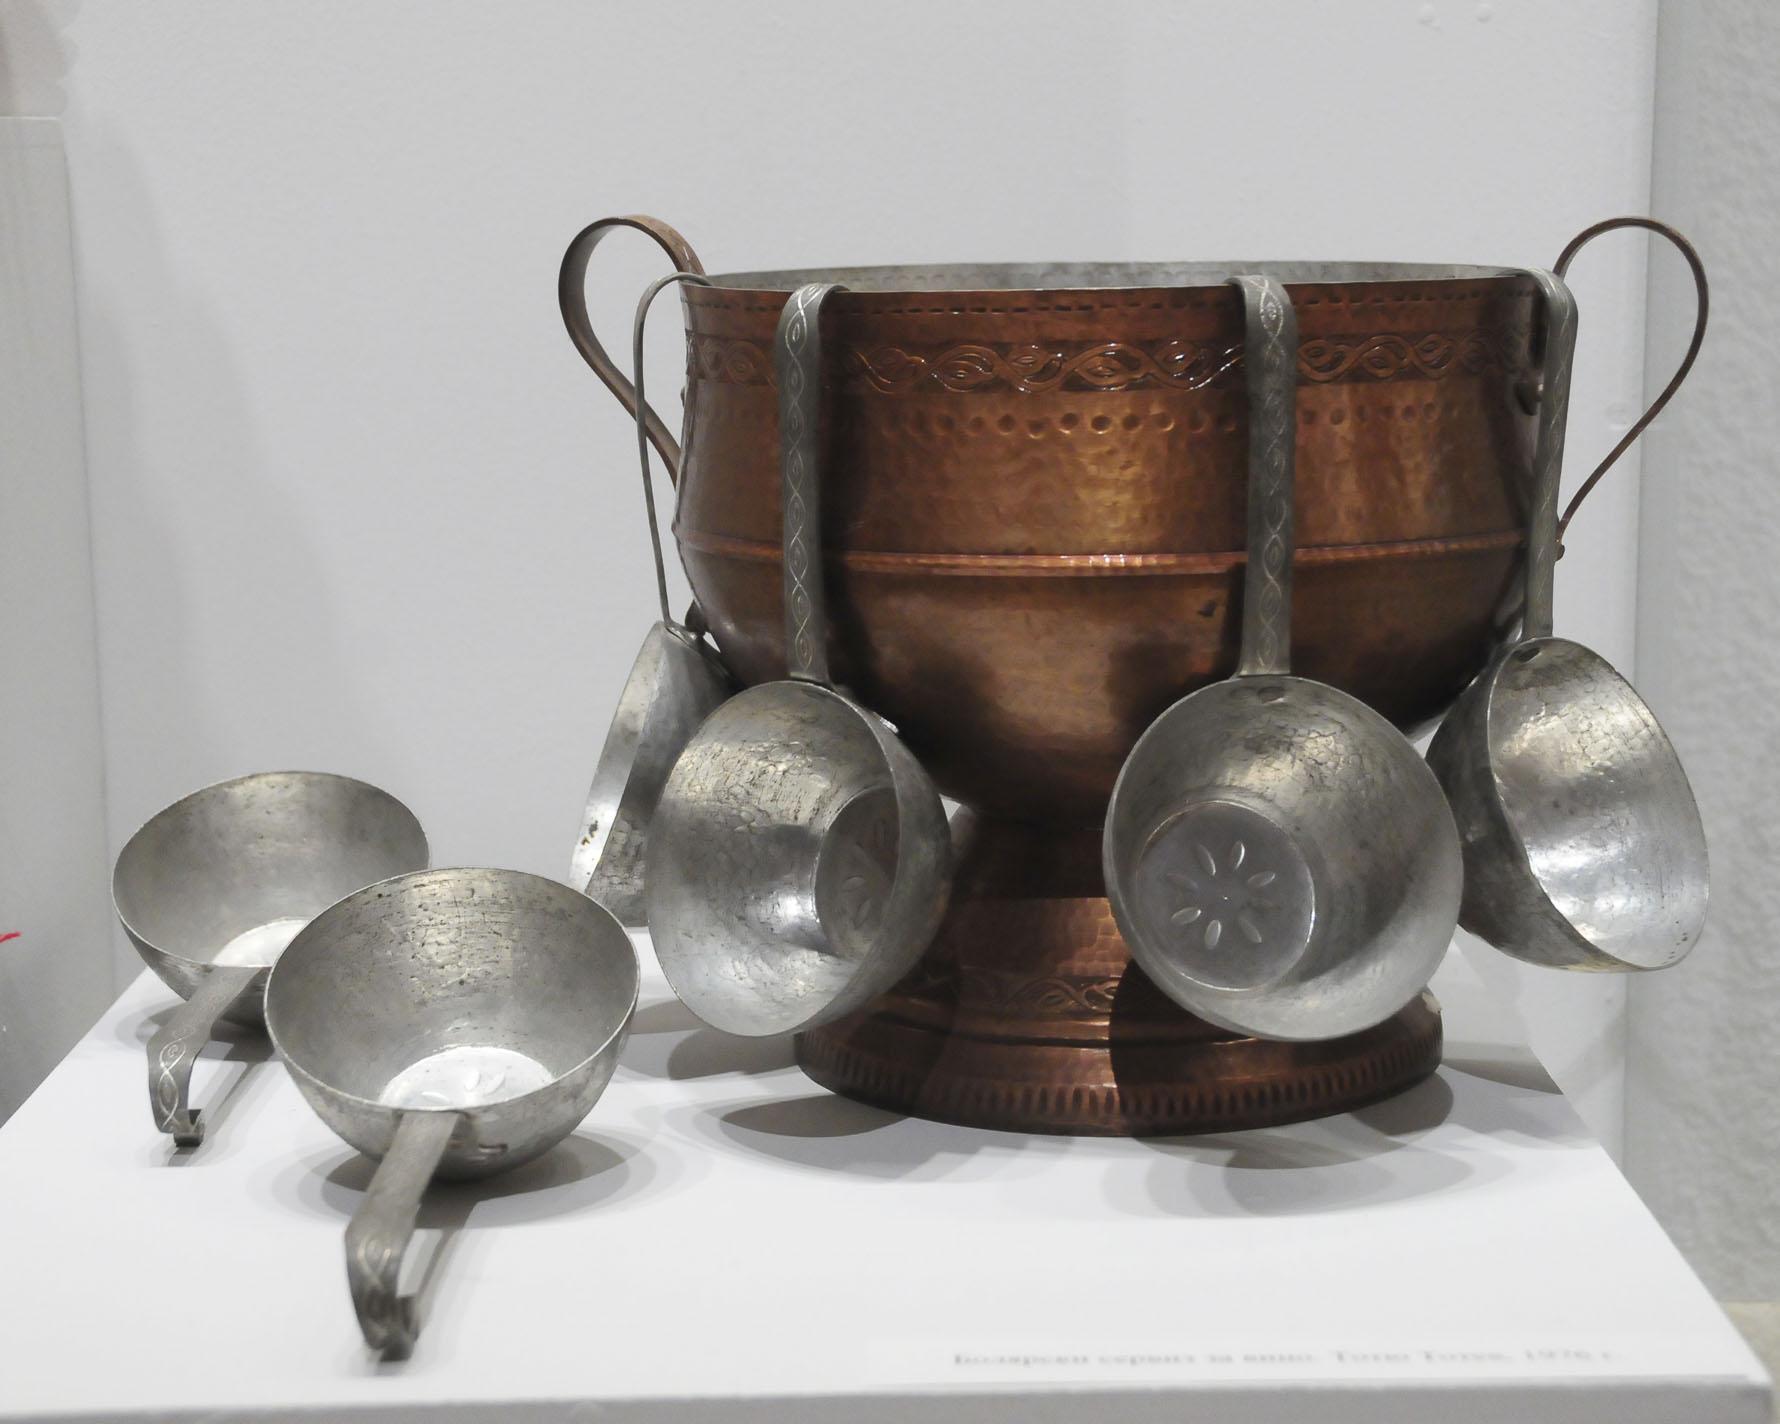 troyan-museum-mednikarstvo-ot-troyanskiq-krai-2